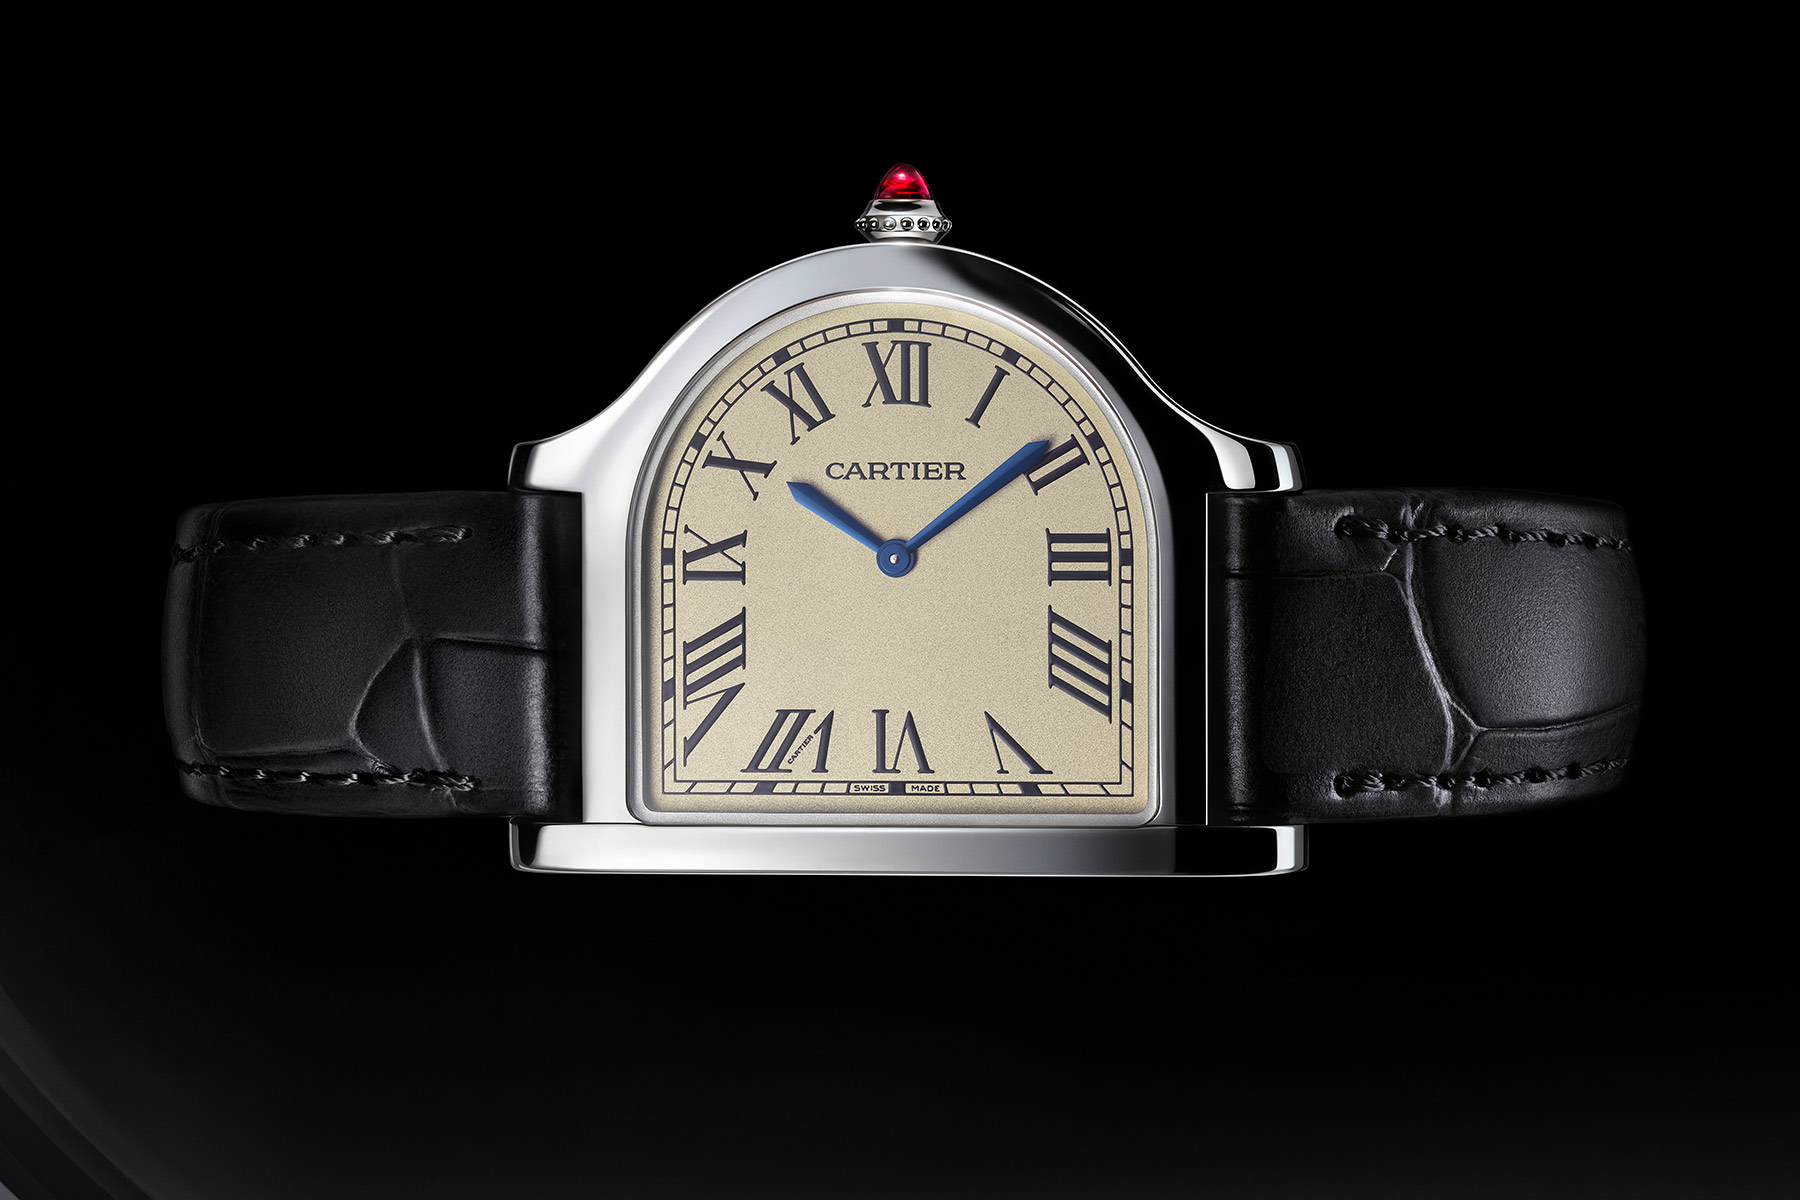 2021 Cloche de Cartier